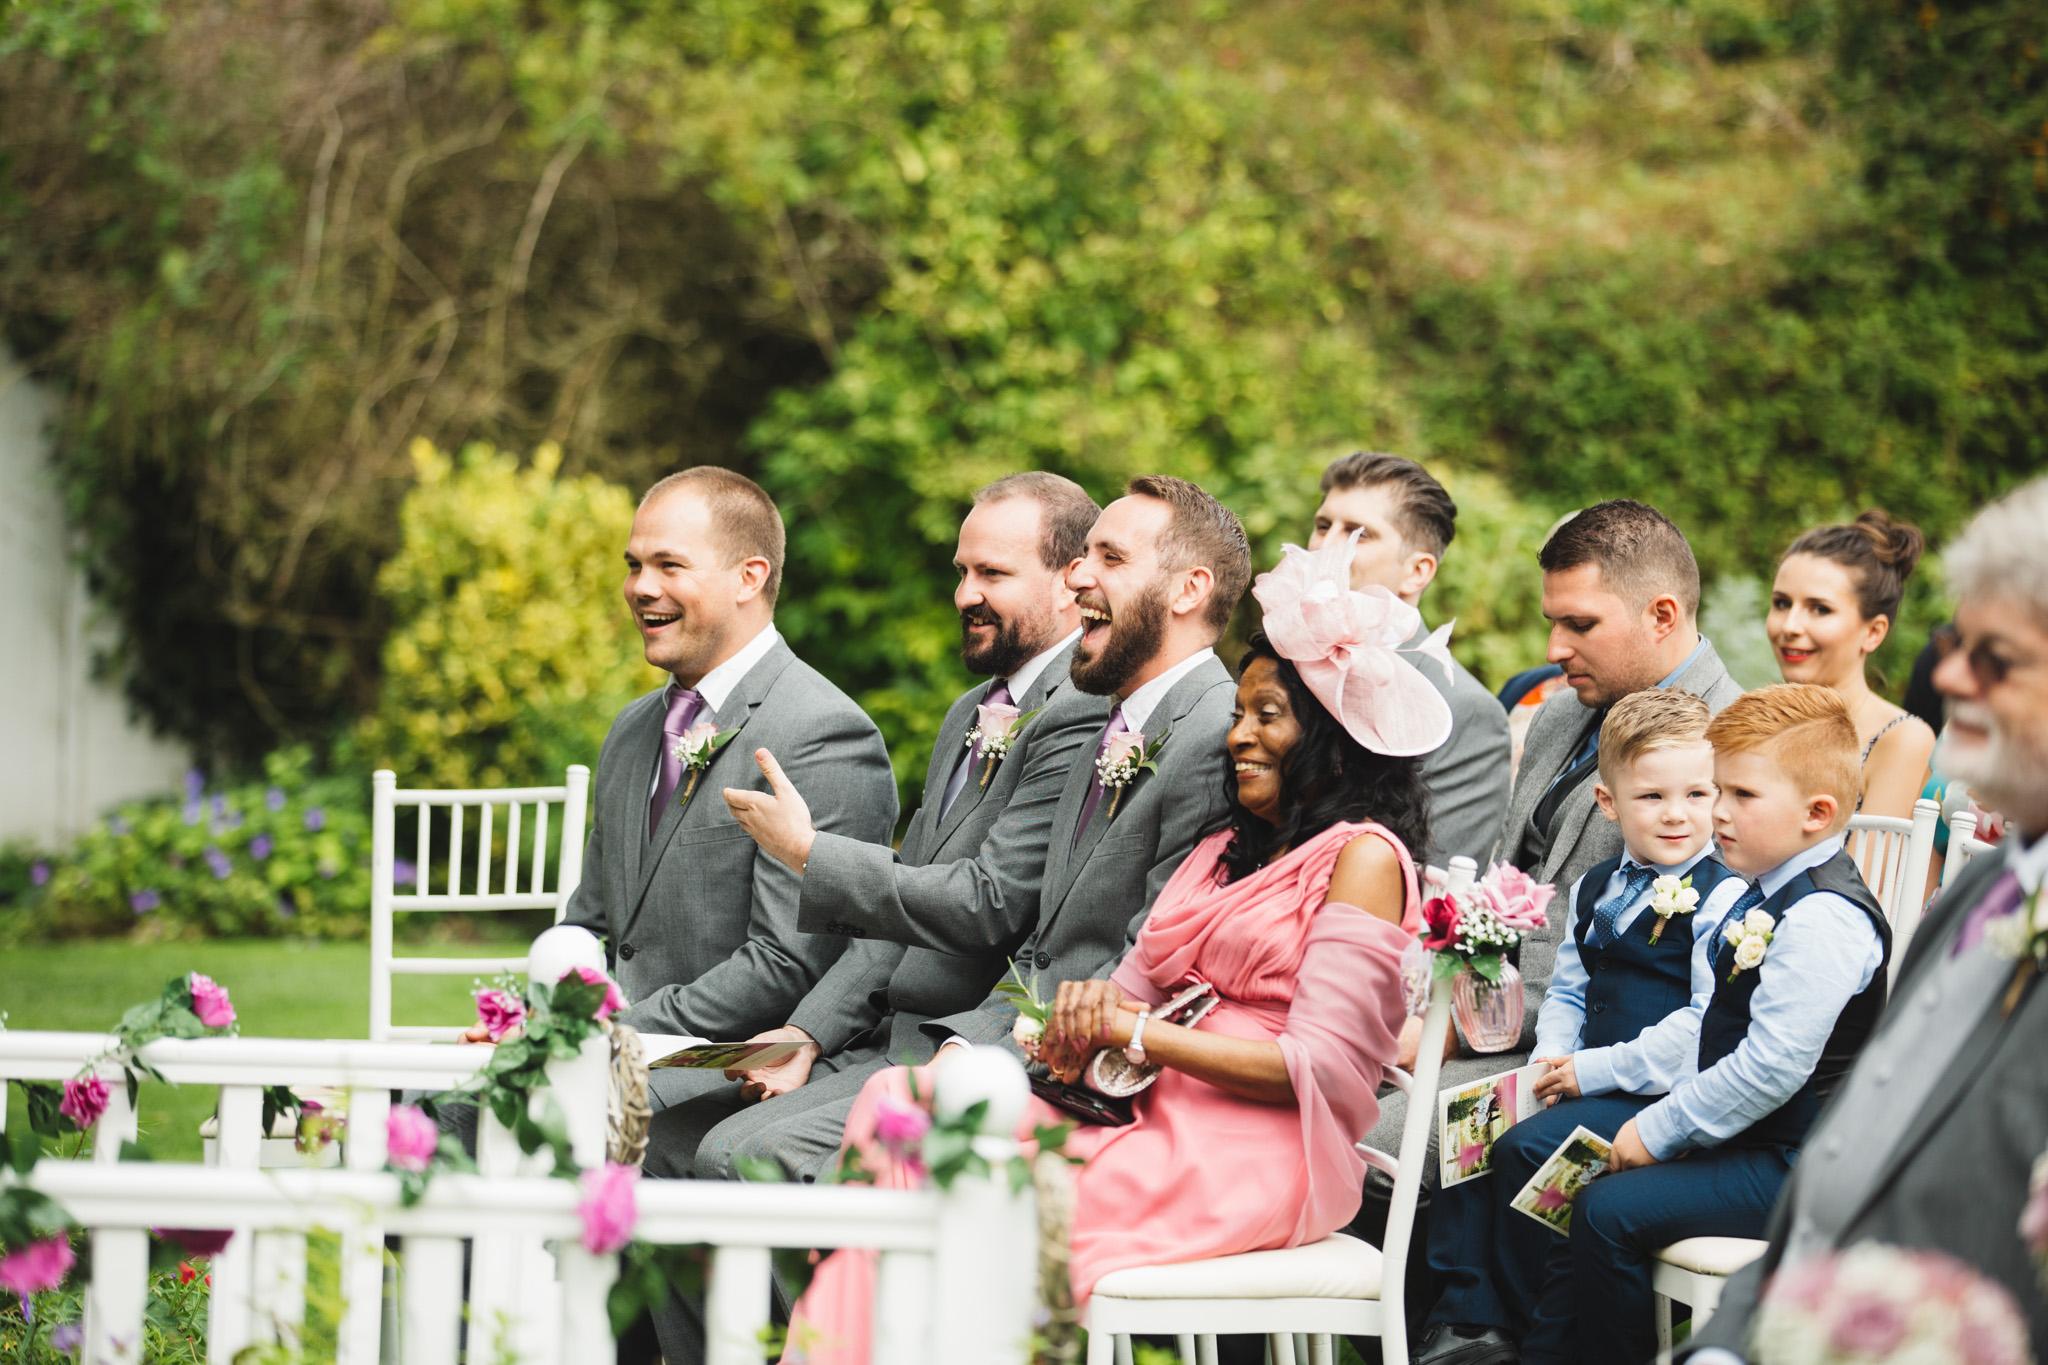 cat-lane-weddings__sheene-mill-wedding-photography__clw__1420_4G2A2937.jpg